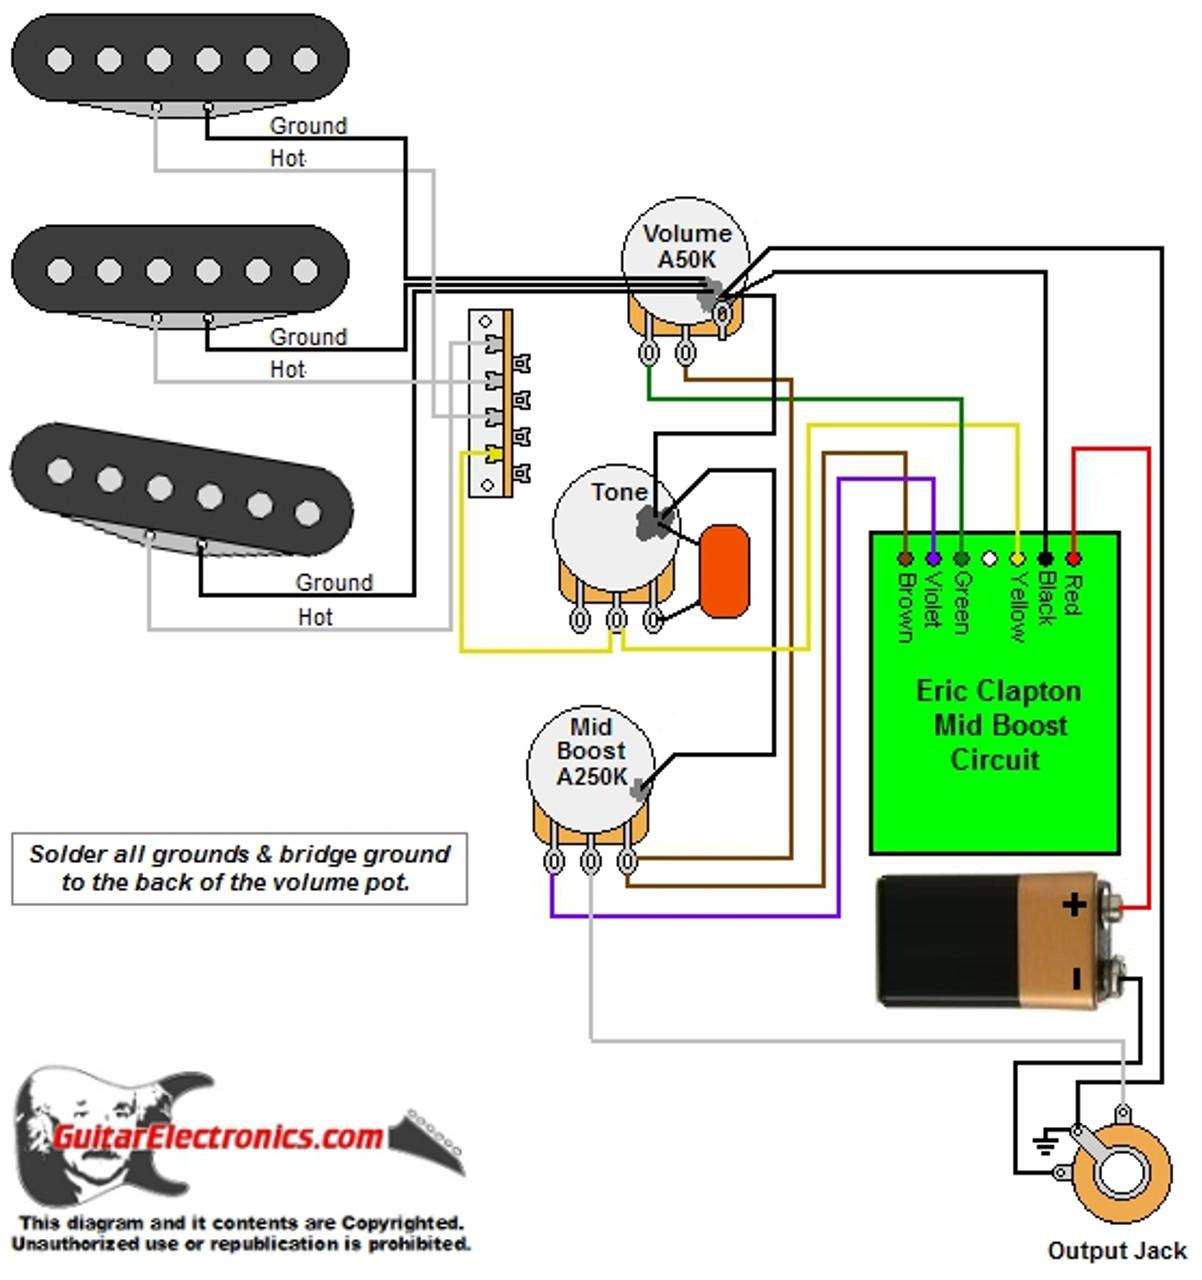 sony car stereo wiring diagram pinterest [ 1202 x 1280 Pixel ]